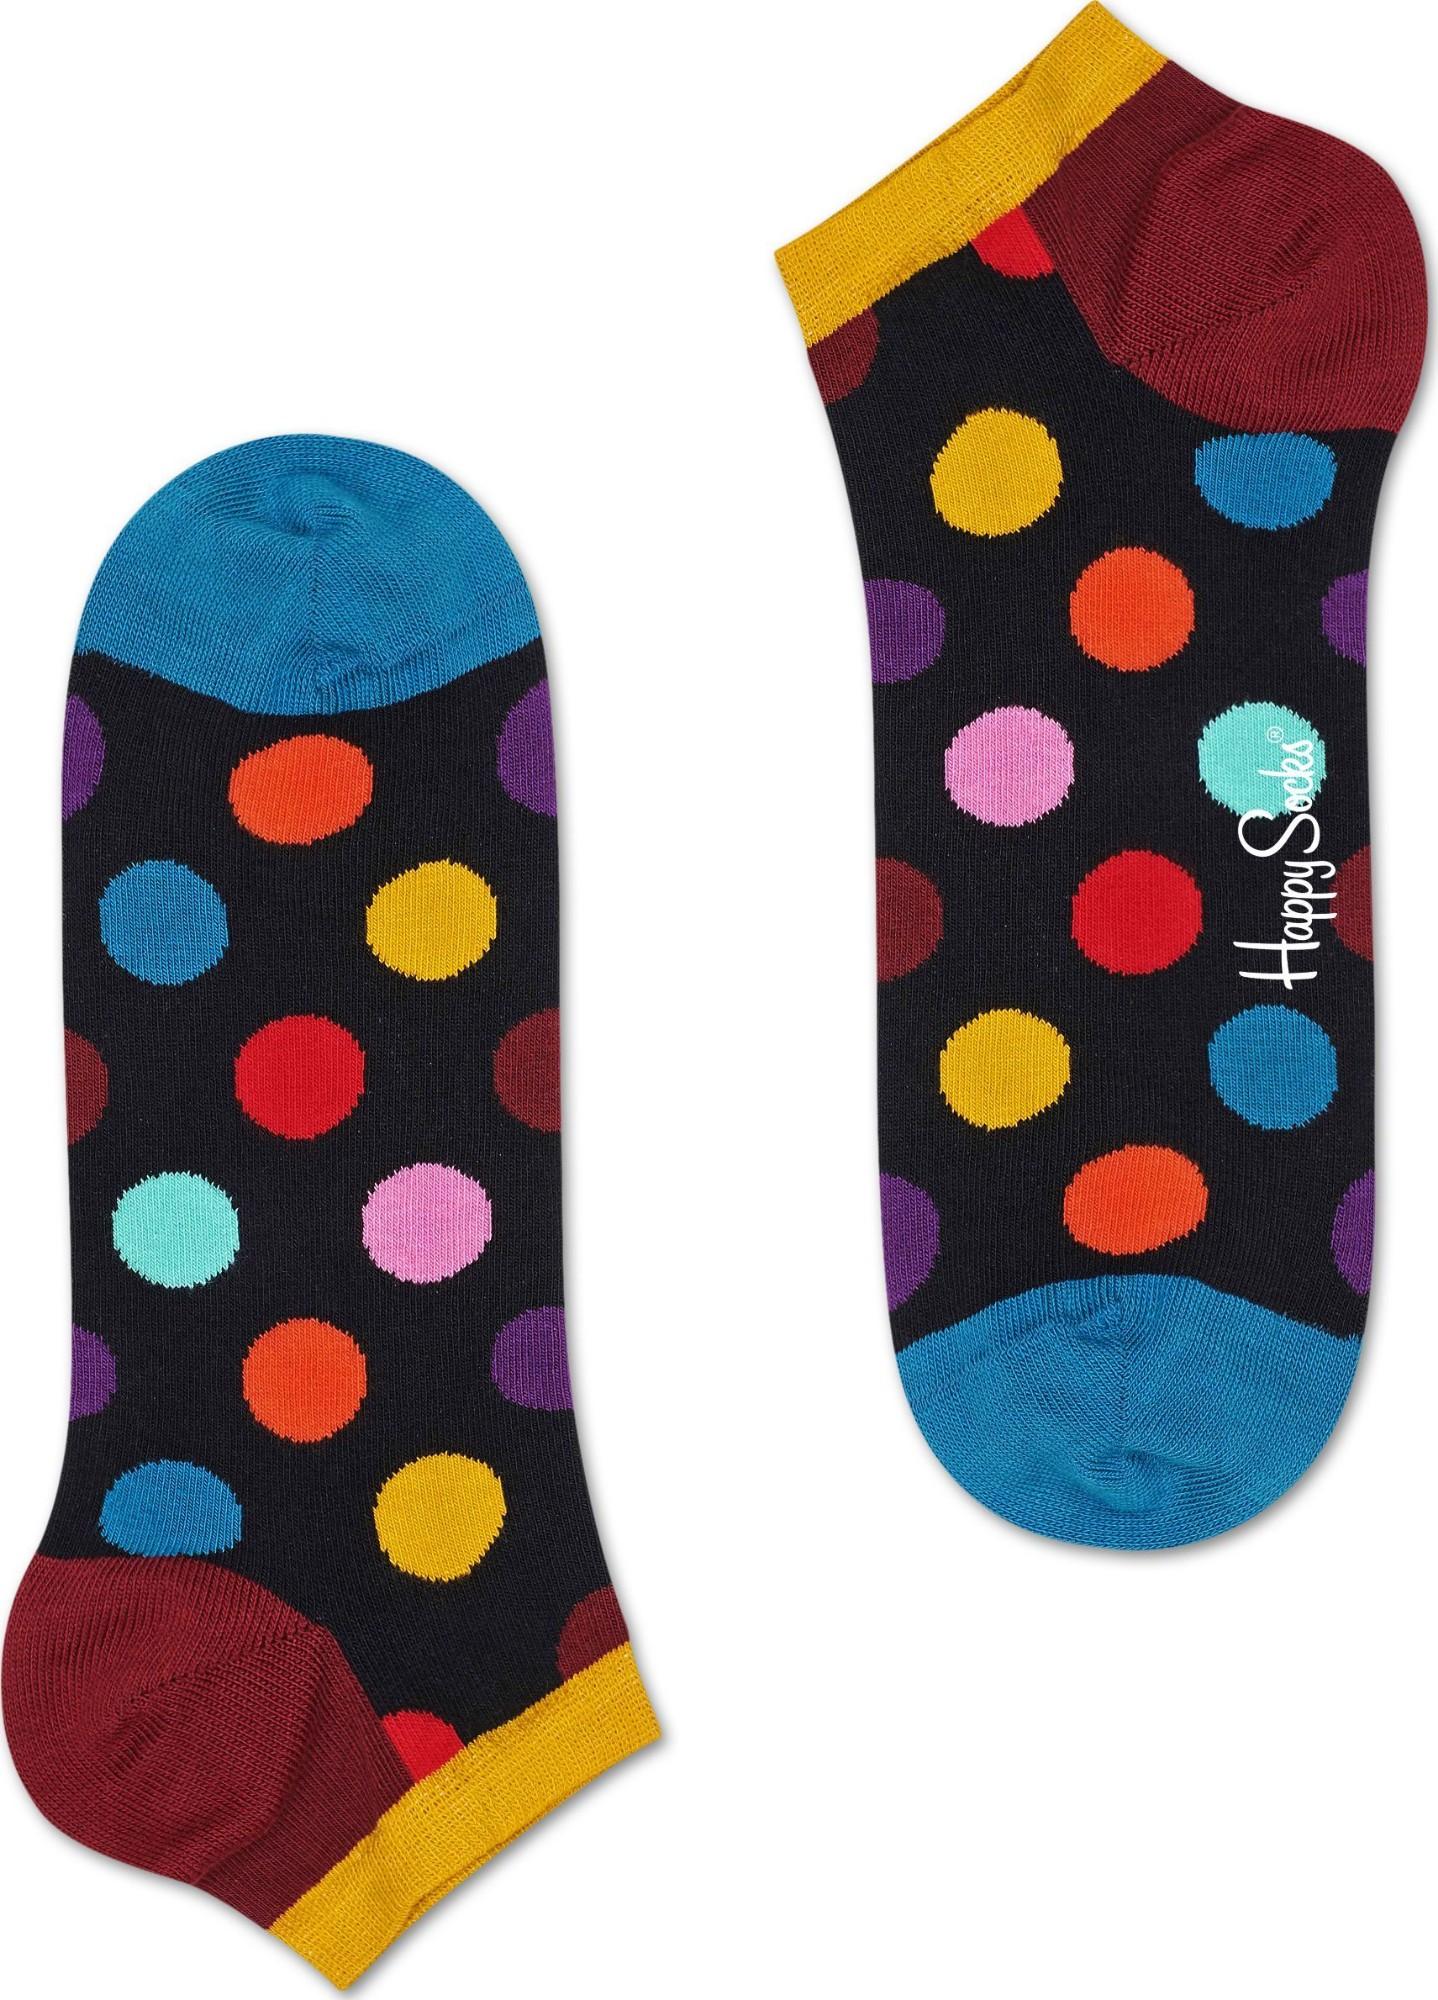 Happy Socks Big Dot Low Multi 0100 41-46